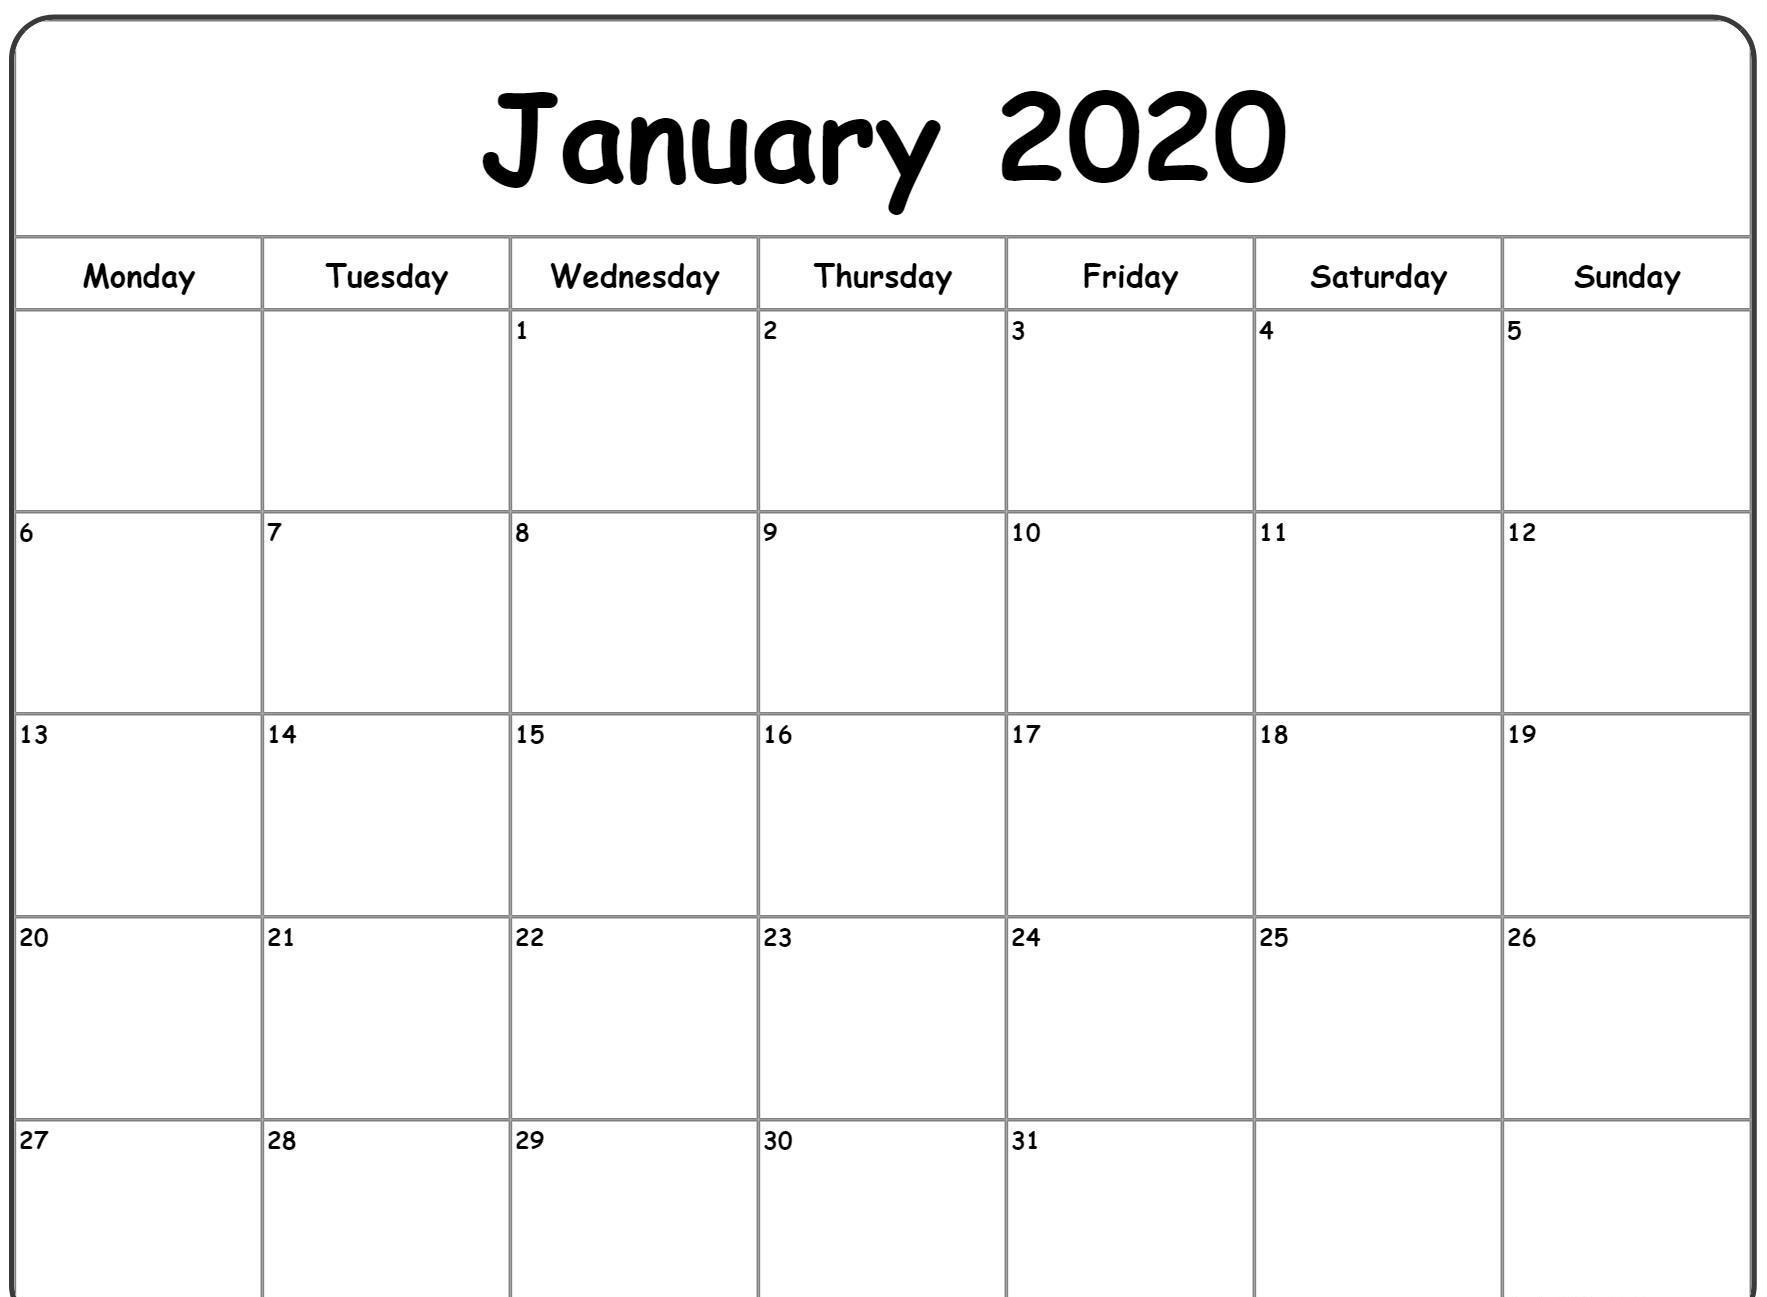 Free Blank January Calendar 2020 Printable Template regarding 2020 Printable Monthly Calendar Free Vertex